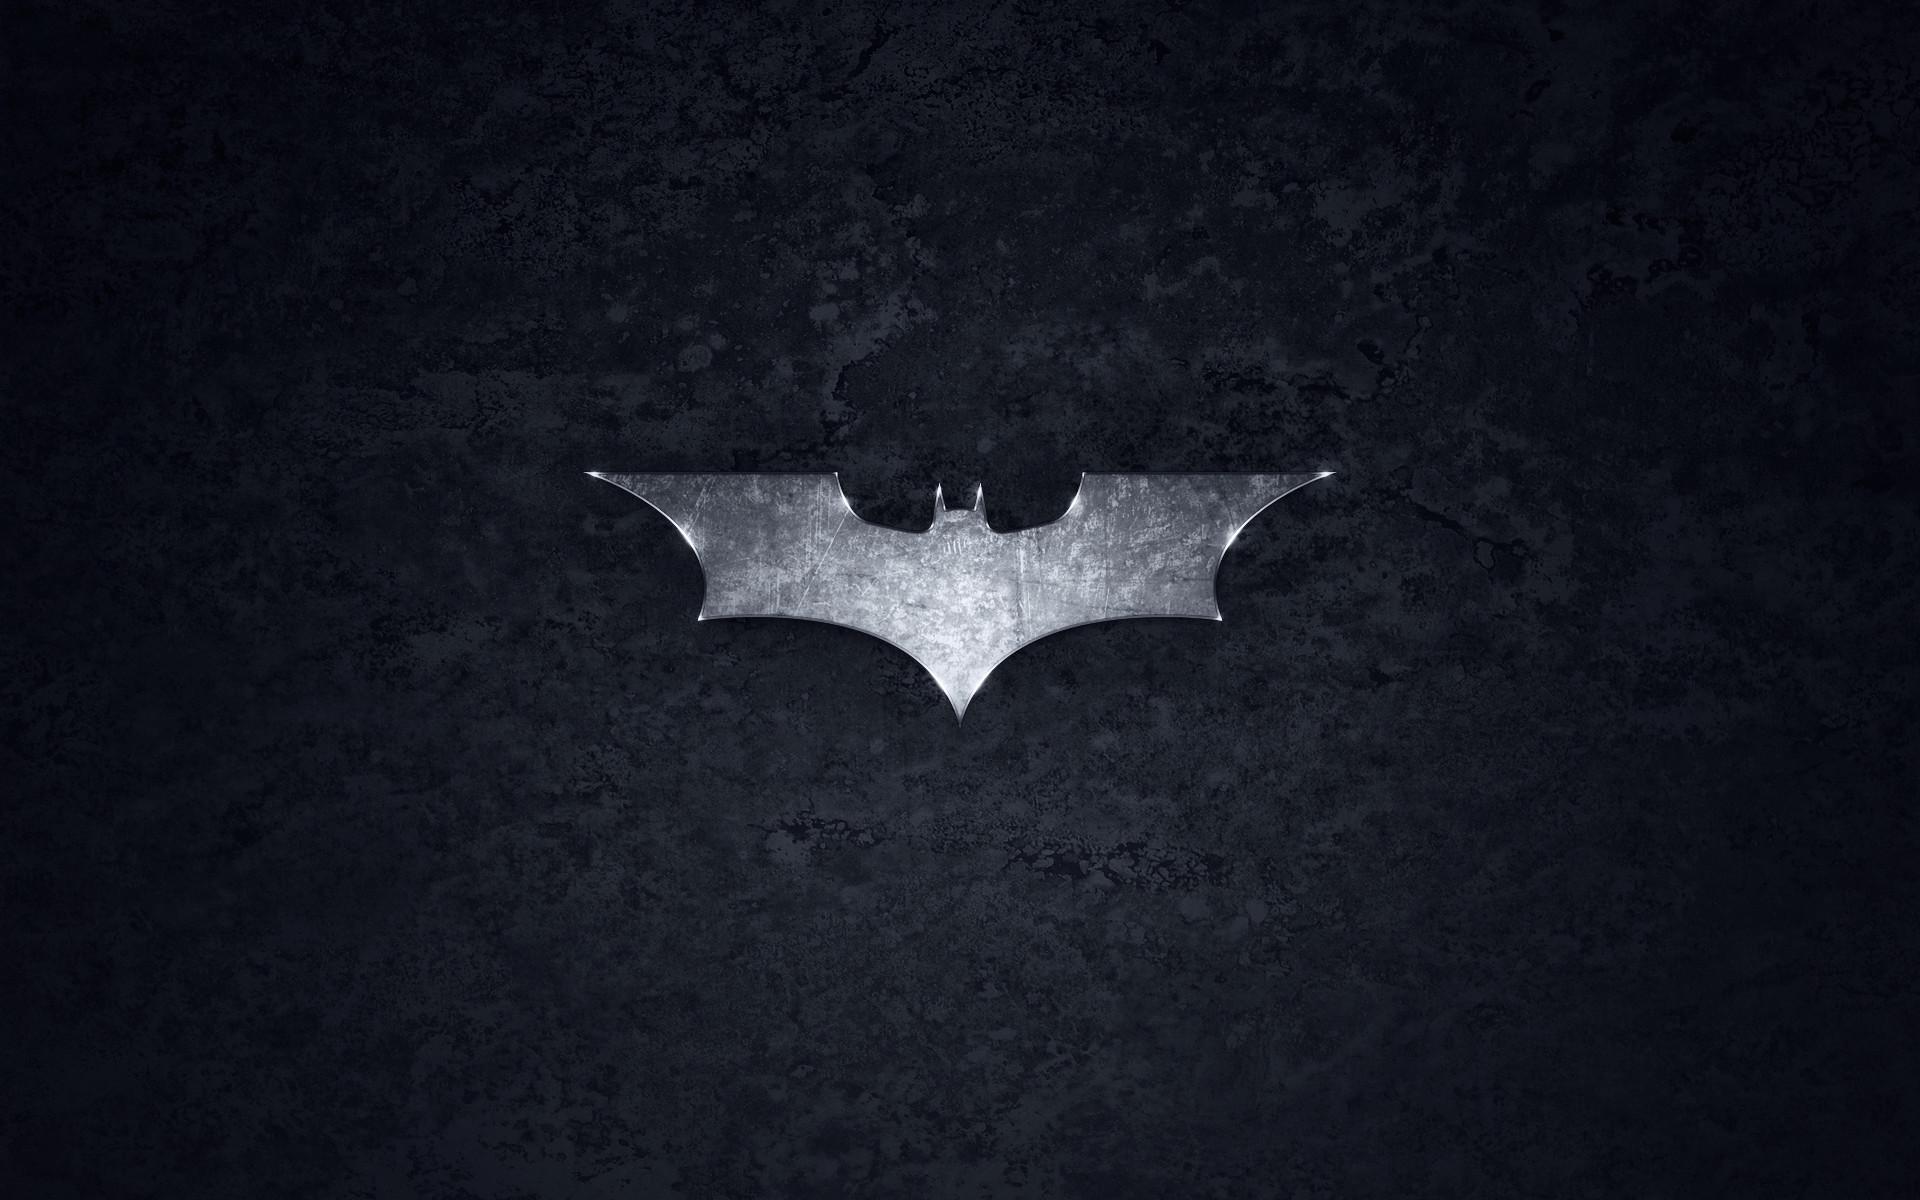 1920x1080 Batman Vs Superman Dawn Of Justice Wallpaper Images 207 O Movie